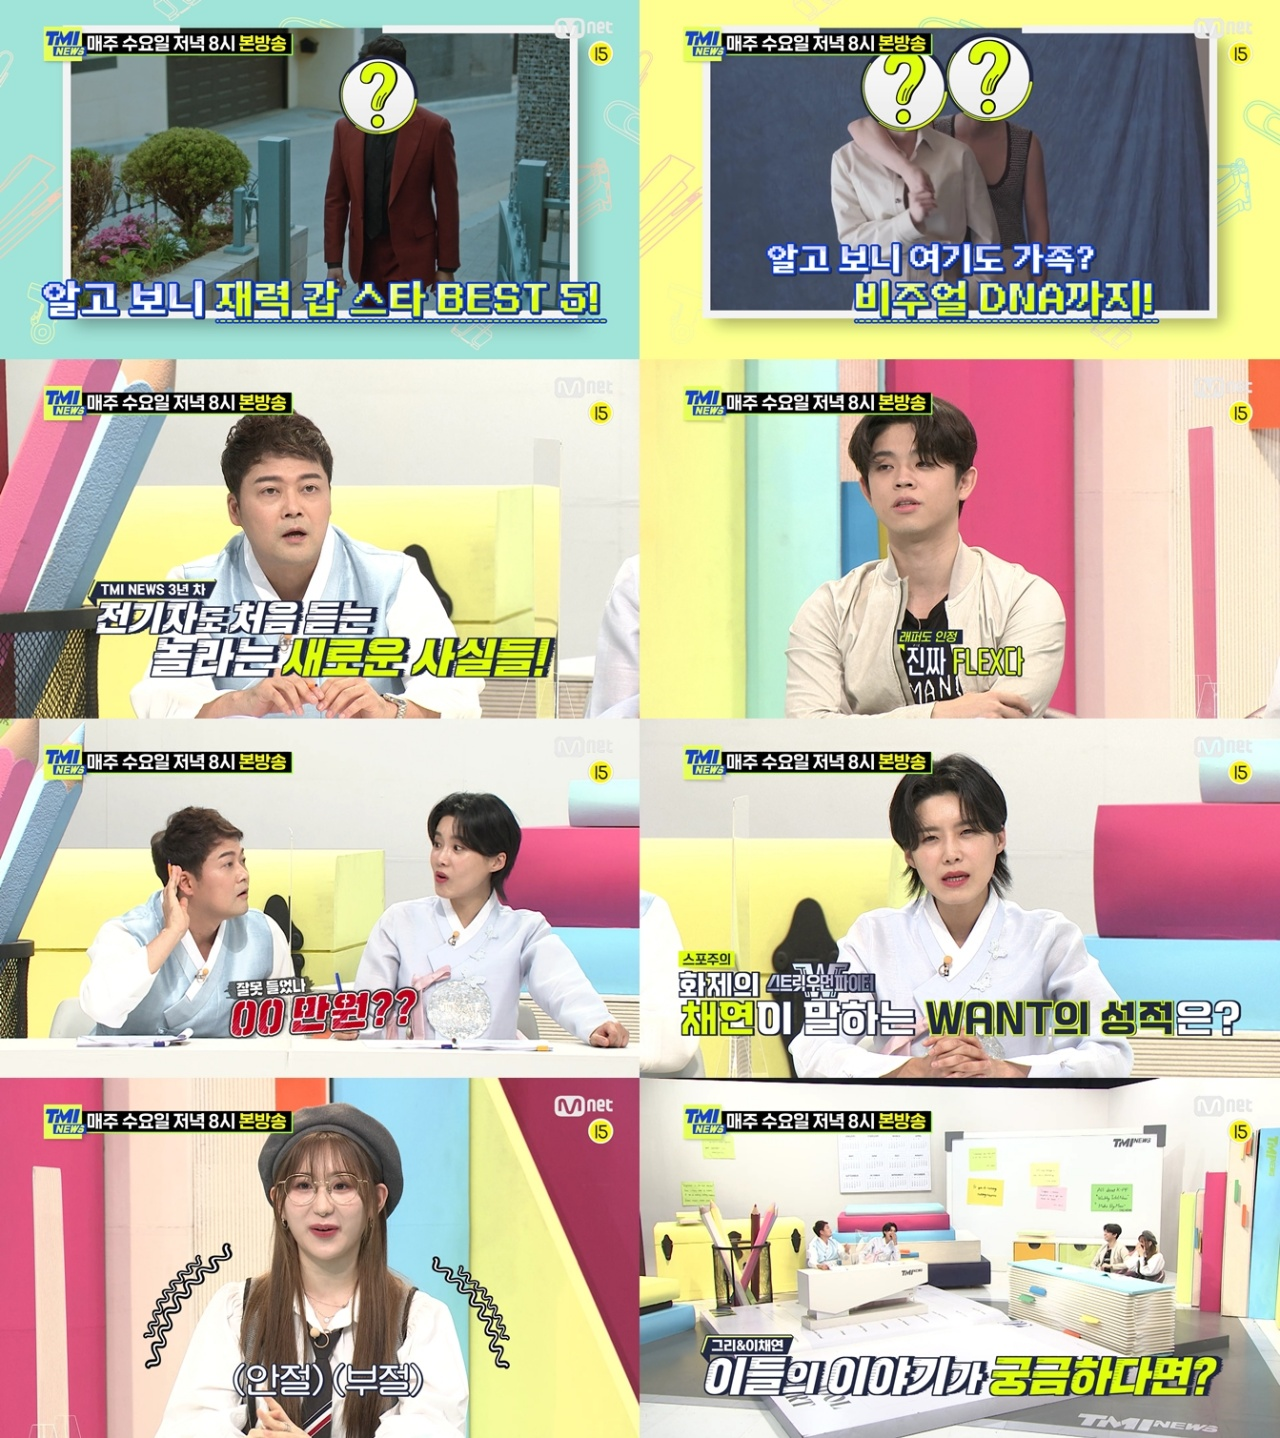 'TMI NEWS' 이채연, '스우파' 스포성 질문에 난색